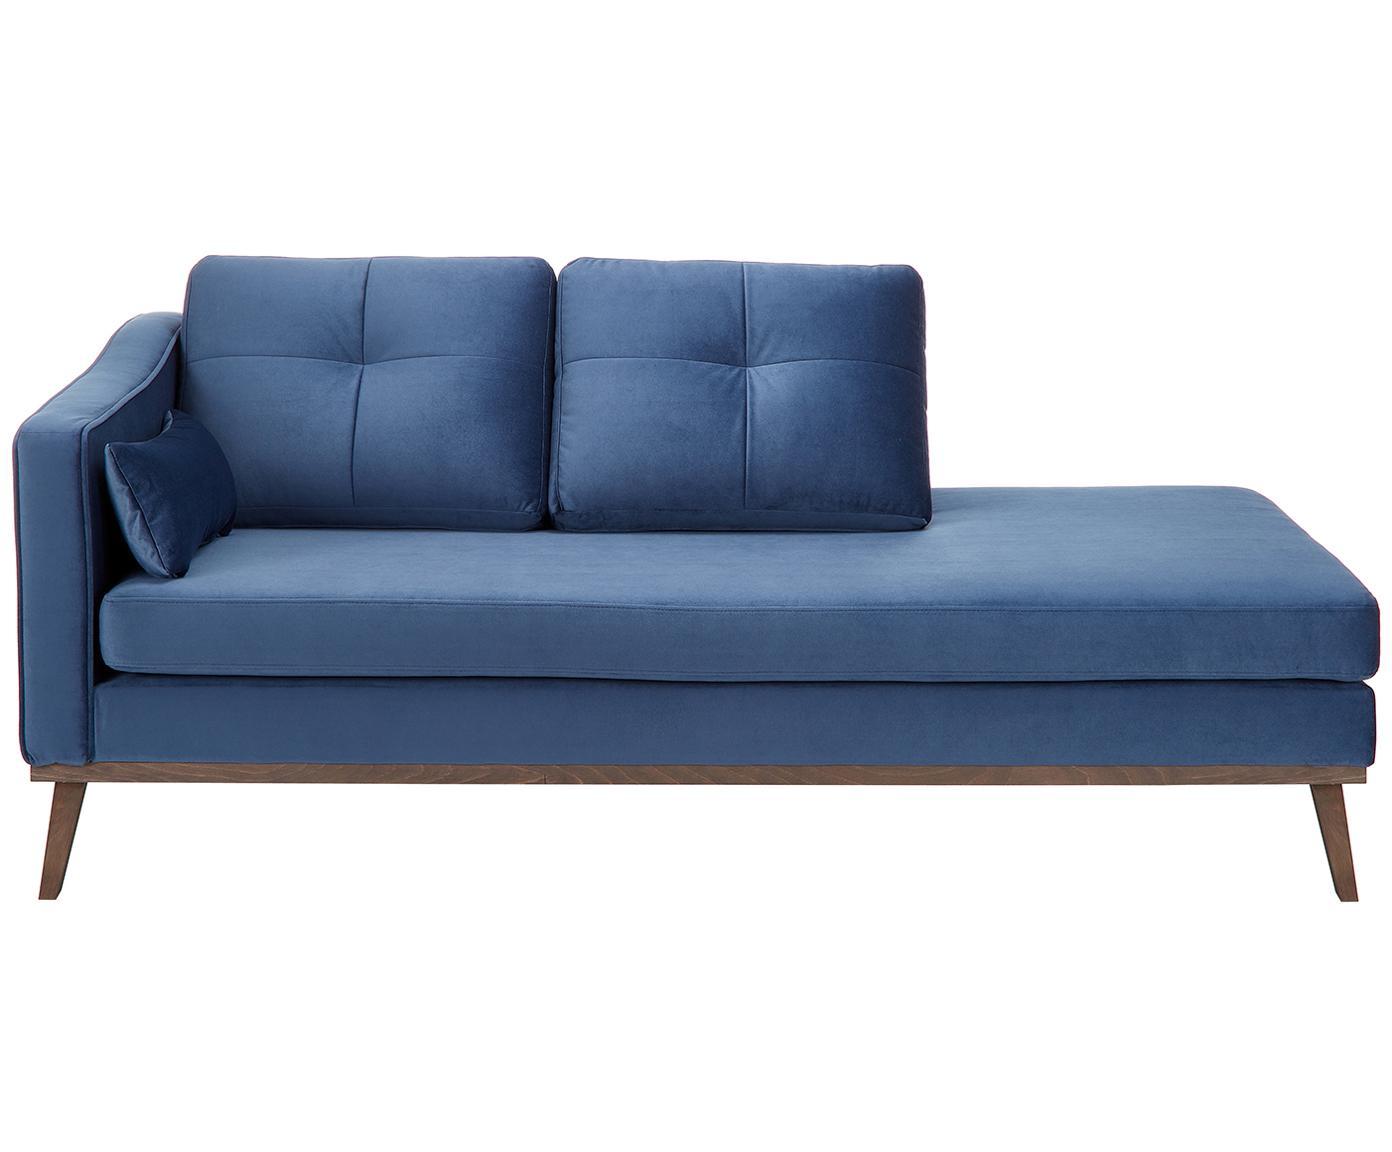 Fluwelen chaise longue Alva, Bekleding: fluweel (hoogwaardig poly, Frame: massief grenenhout, Poten: massief beukenhout gebeit, Marineblauw, B 193 x D 94 cm